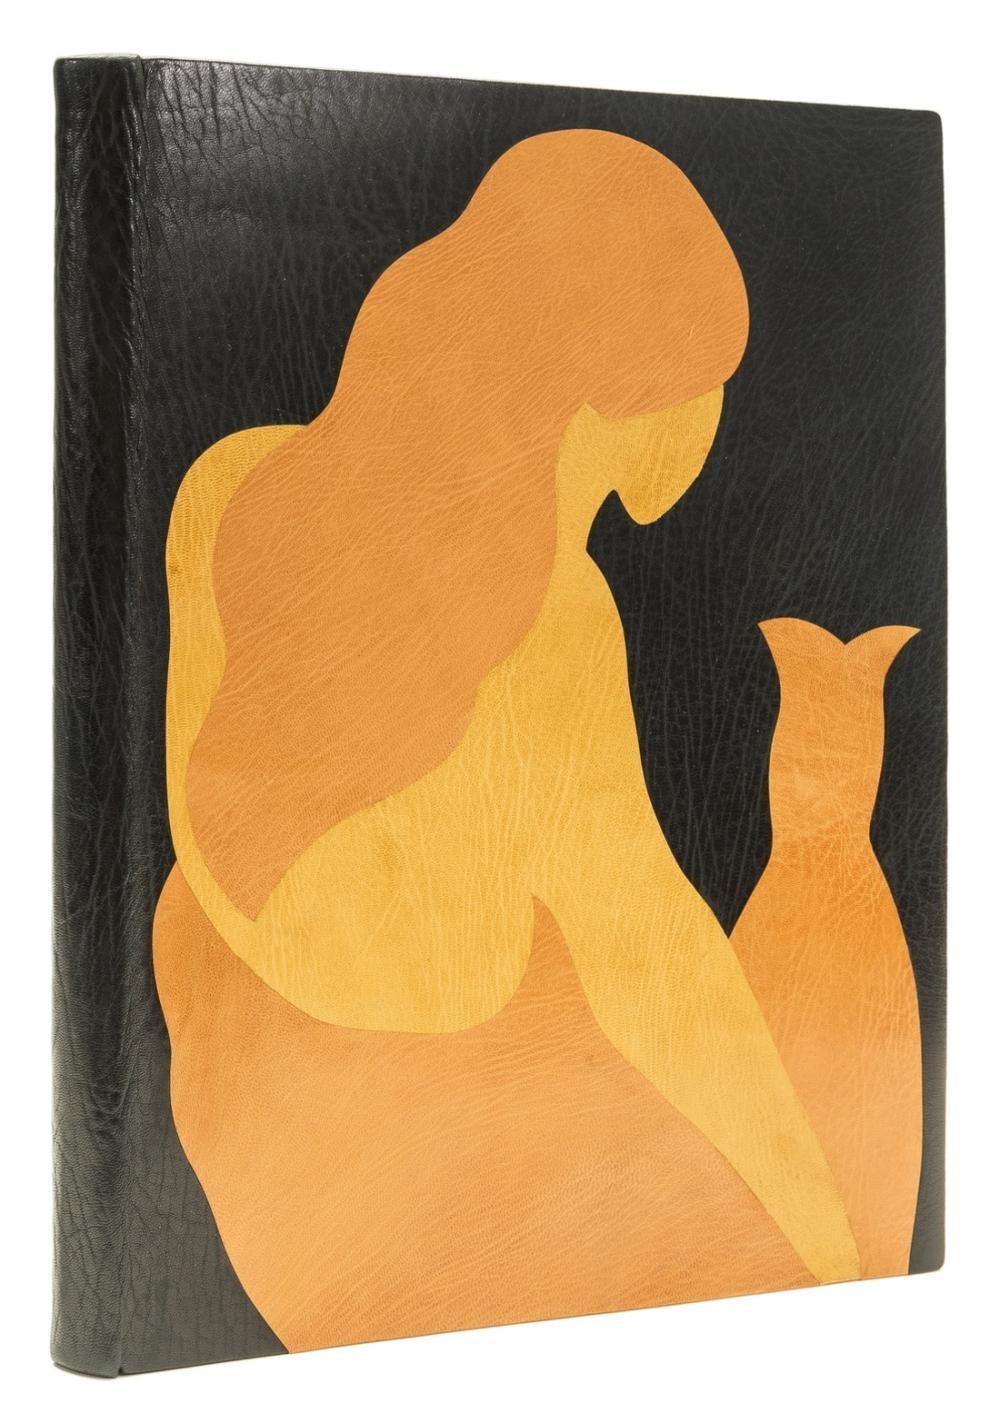 Whittington Press.- Omar Khayyám. The Mirror & the Eye. Rubaiyat, one of 6 specially-bound copies with design in inlaid goatskin, Andoversford, Whittington Press, 1984.